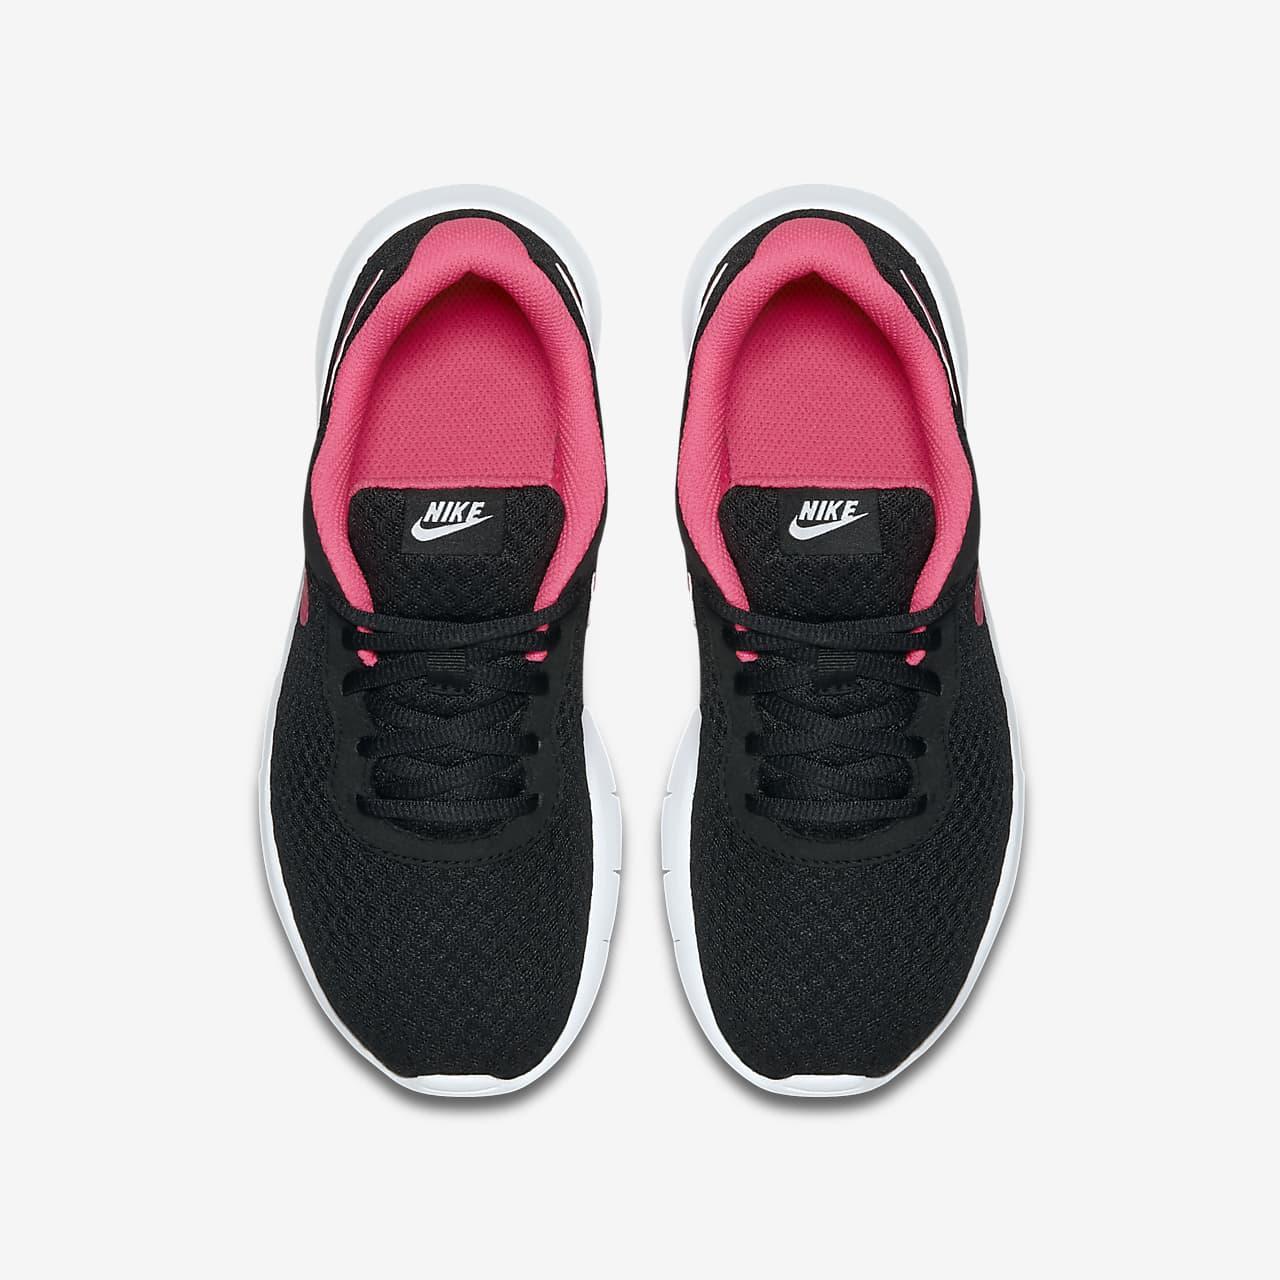 NIKE Older Kids Tanjun Sneakers